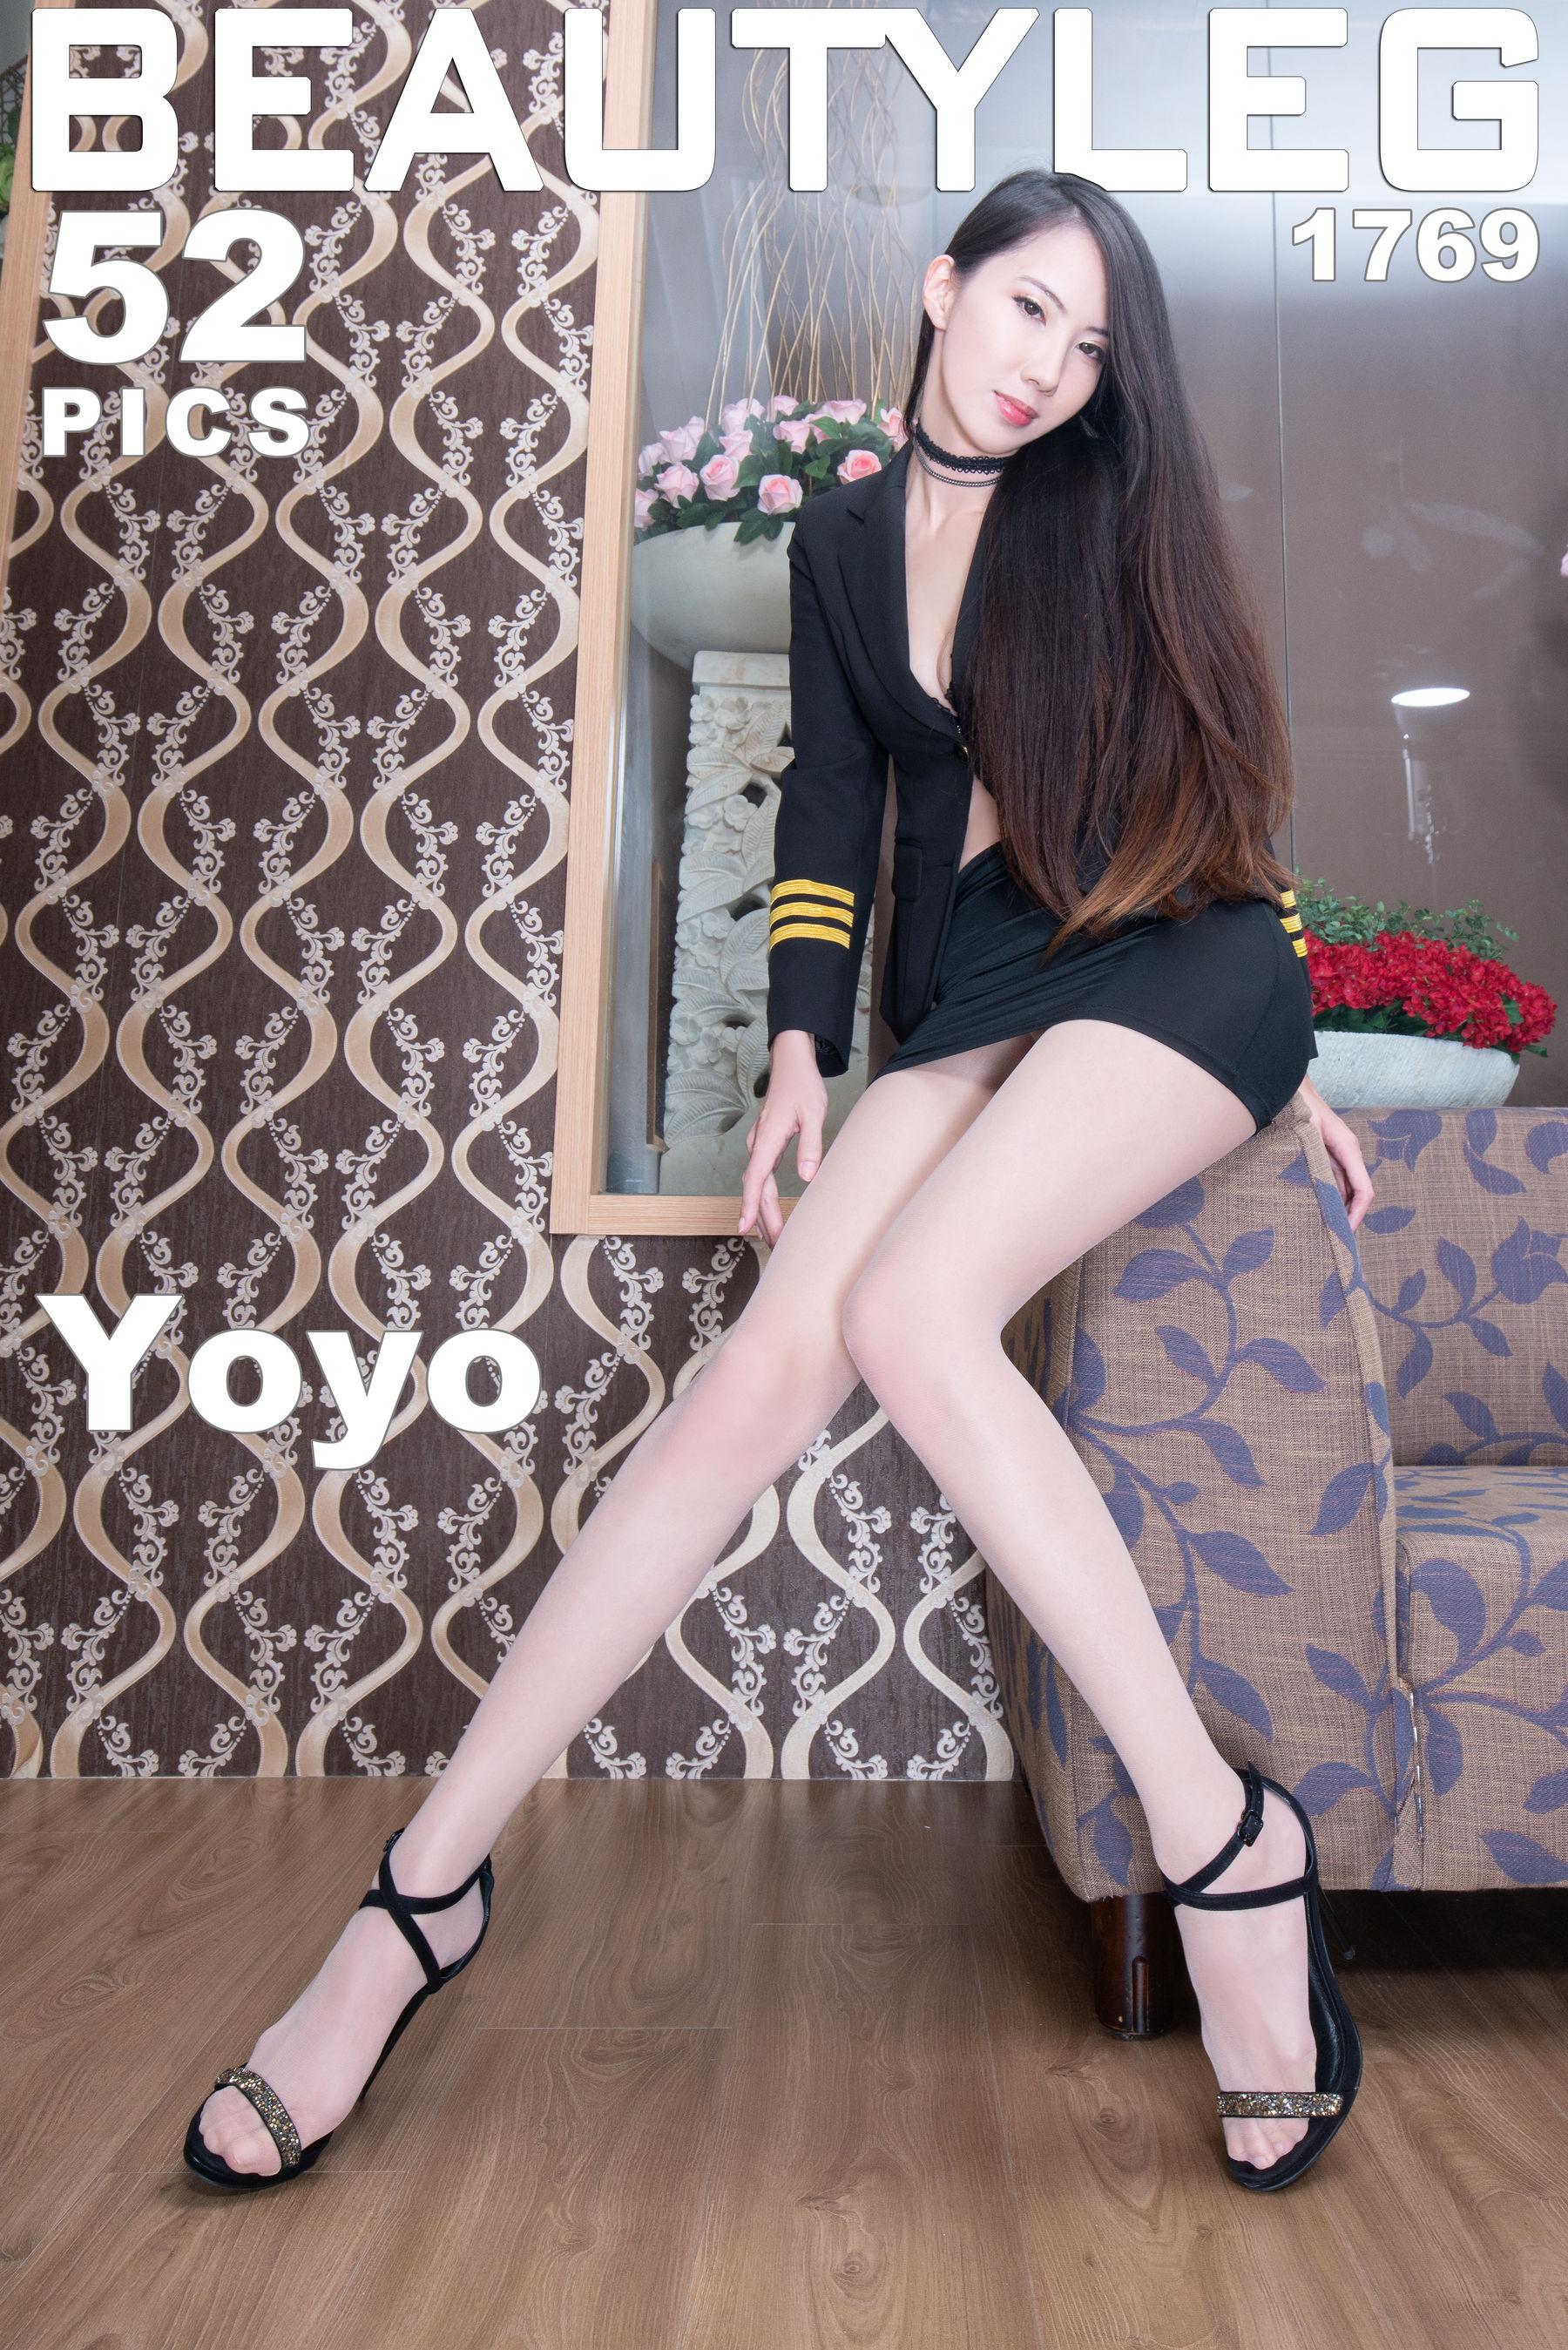 VOL.1716 [Beautyleg]高跟OL美女长腿美女:童采萱(Beautyleg Yoyo,腿模Yoyo)超高清个人性感漂亮大图(46P)